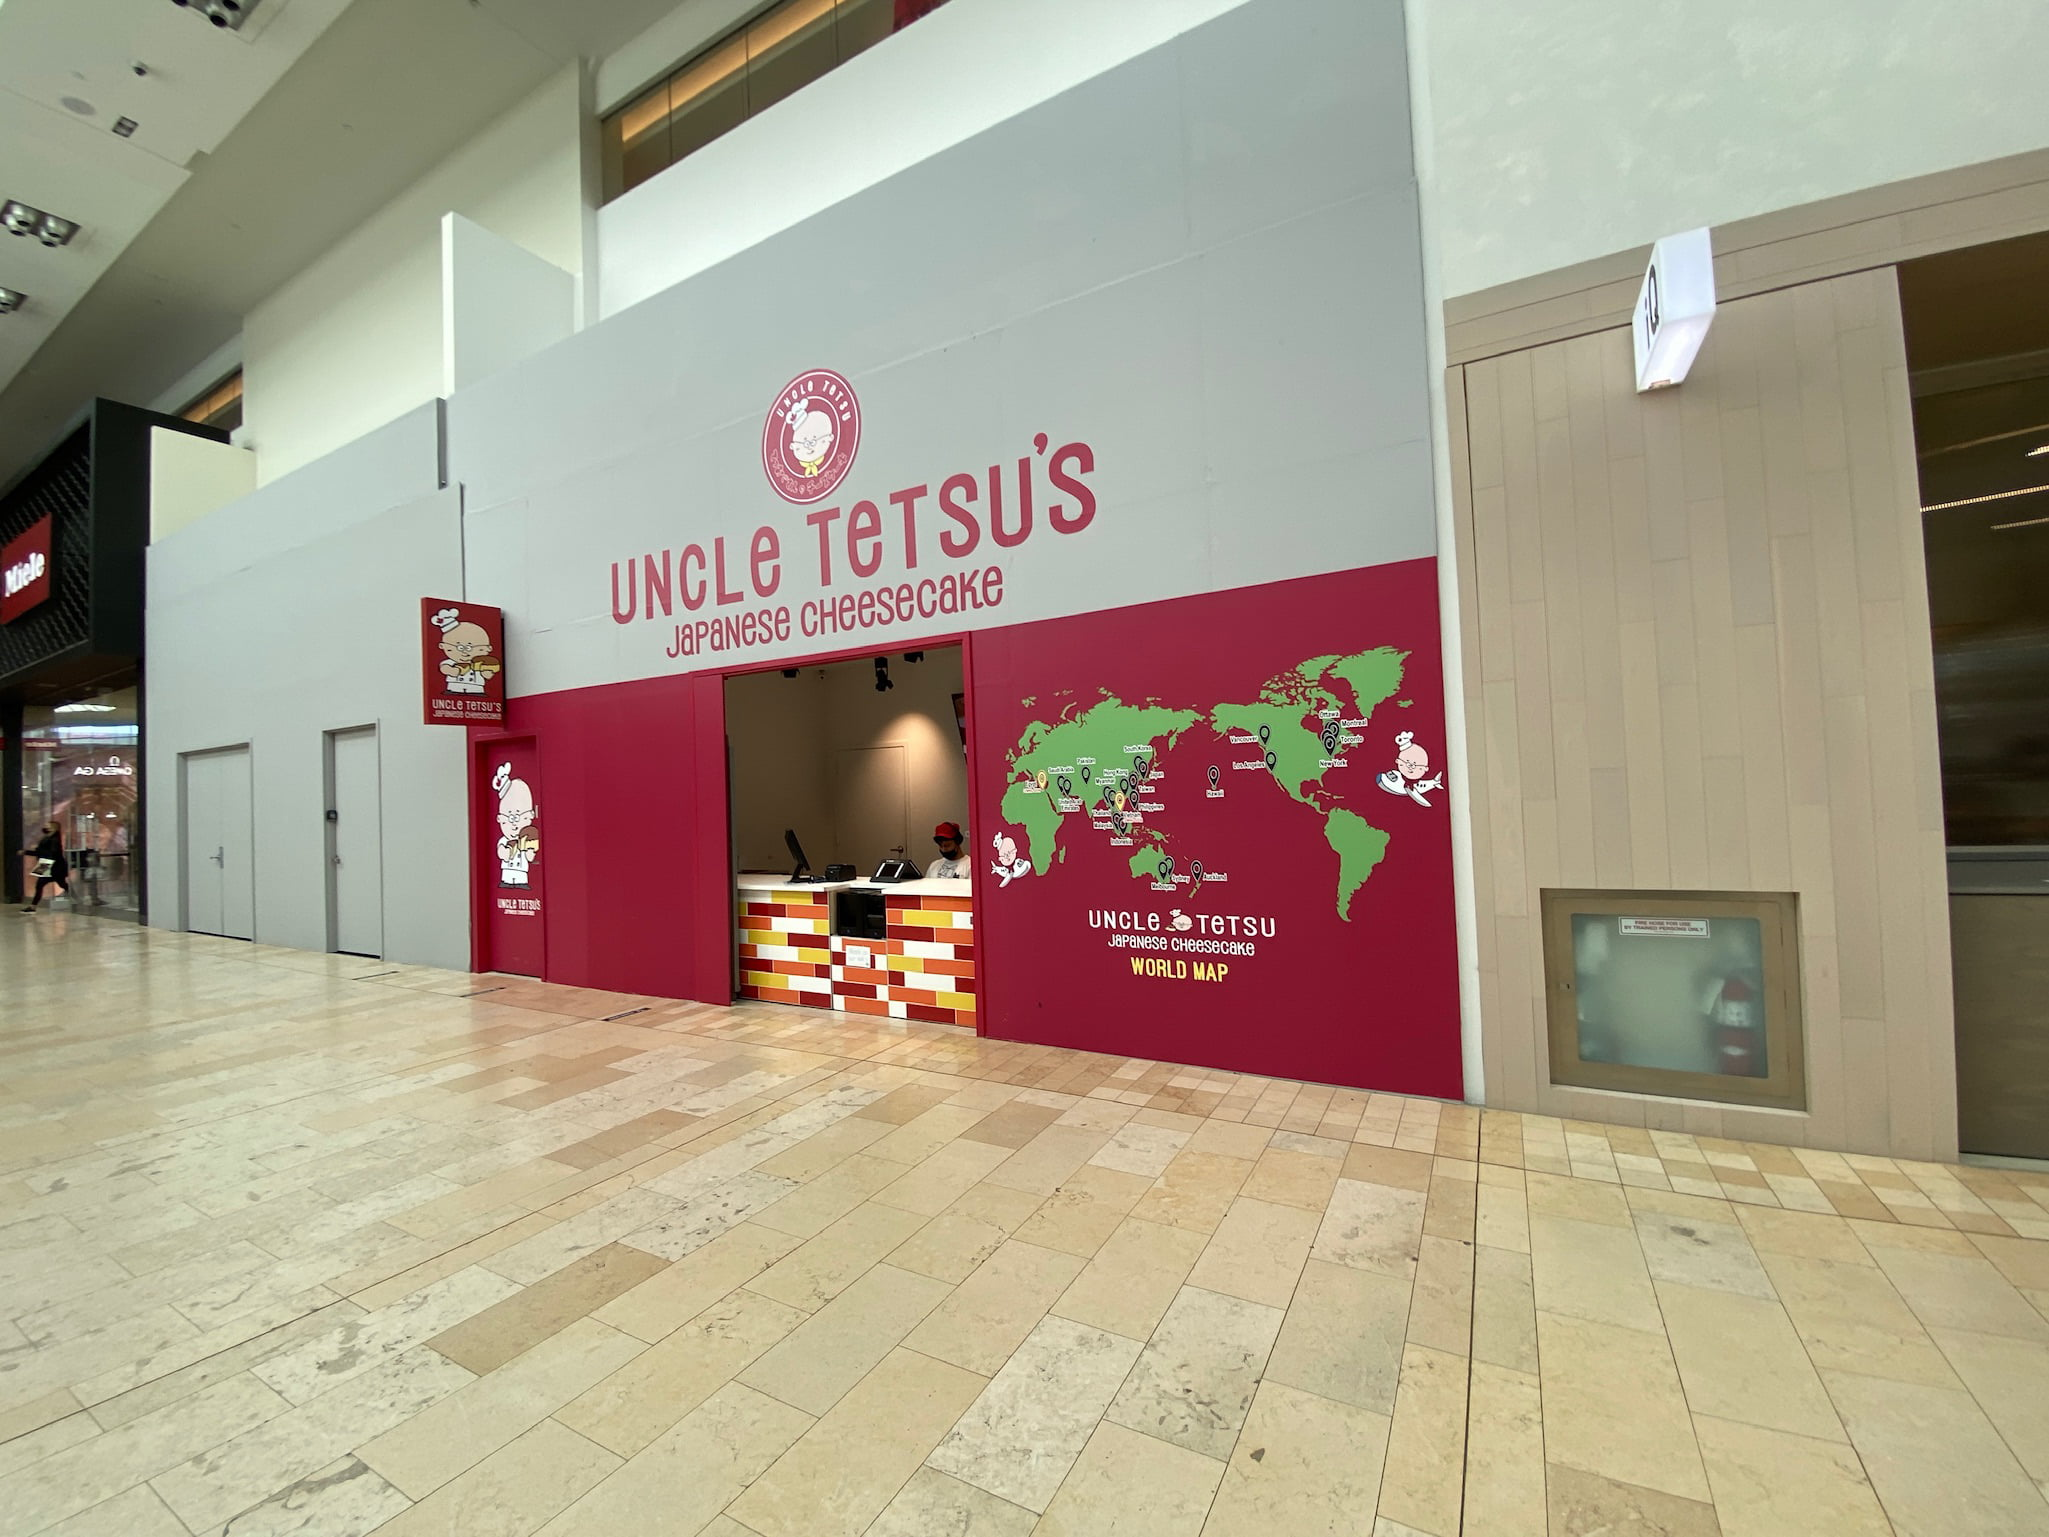 Uncle Tetsu at Yorkdale